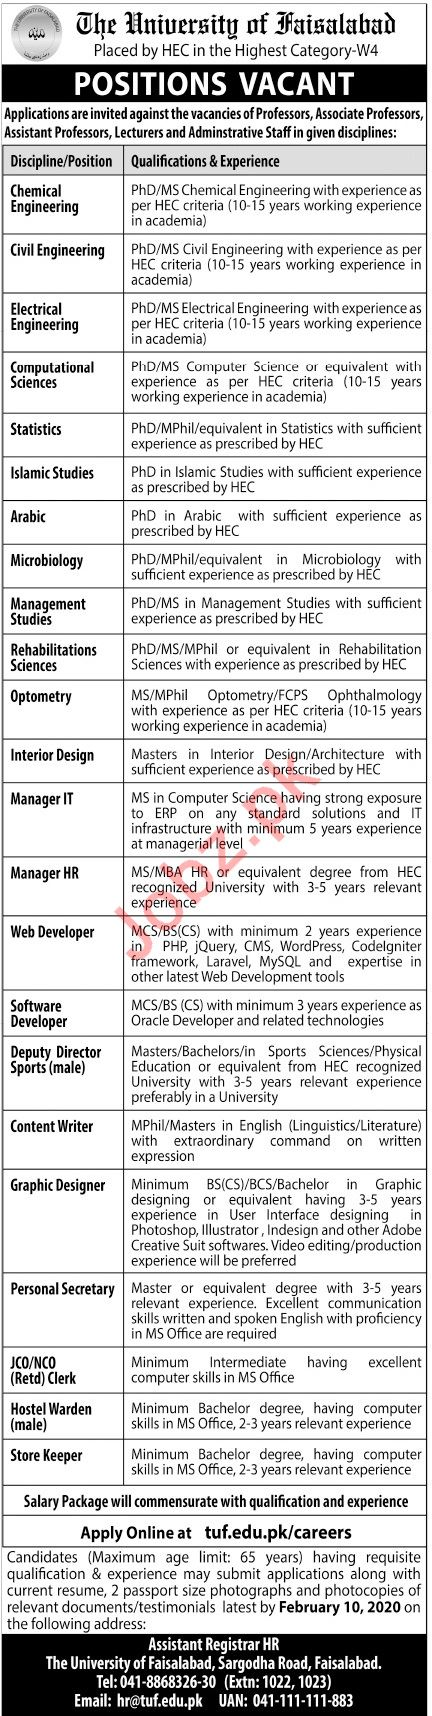 The University of Faisalabad TUF Management Jobs 2020